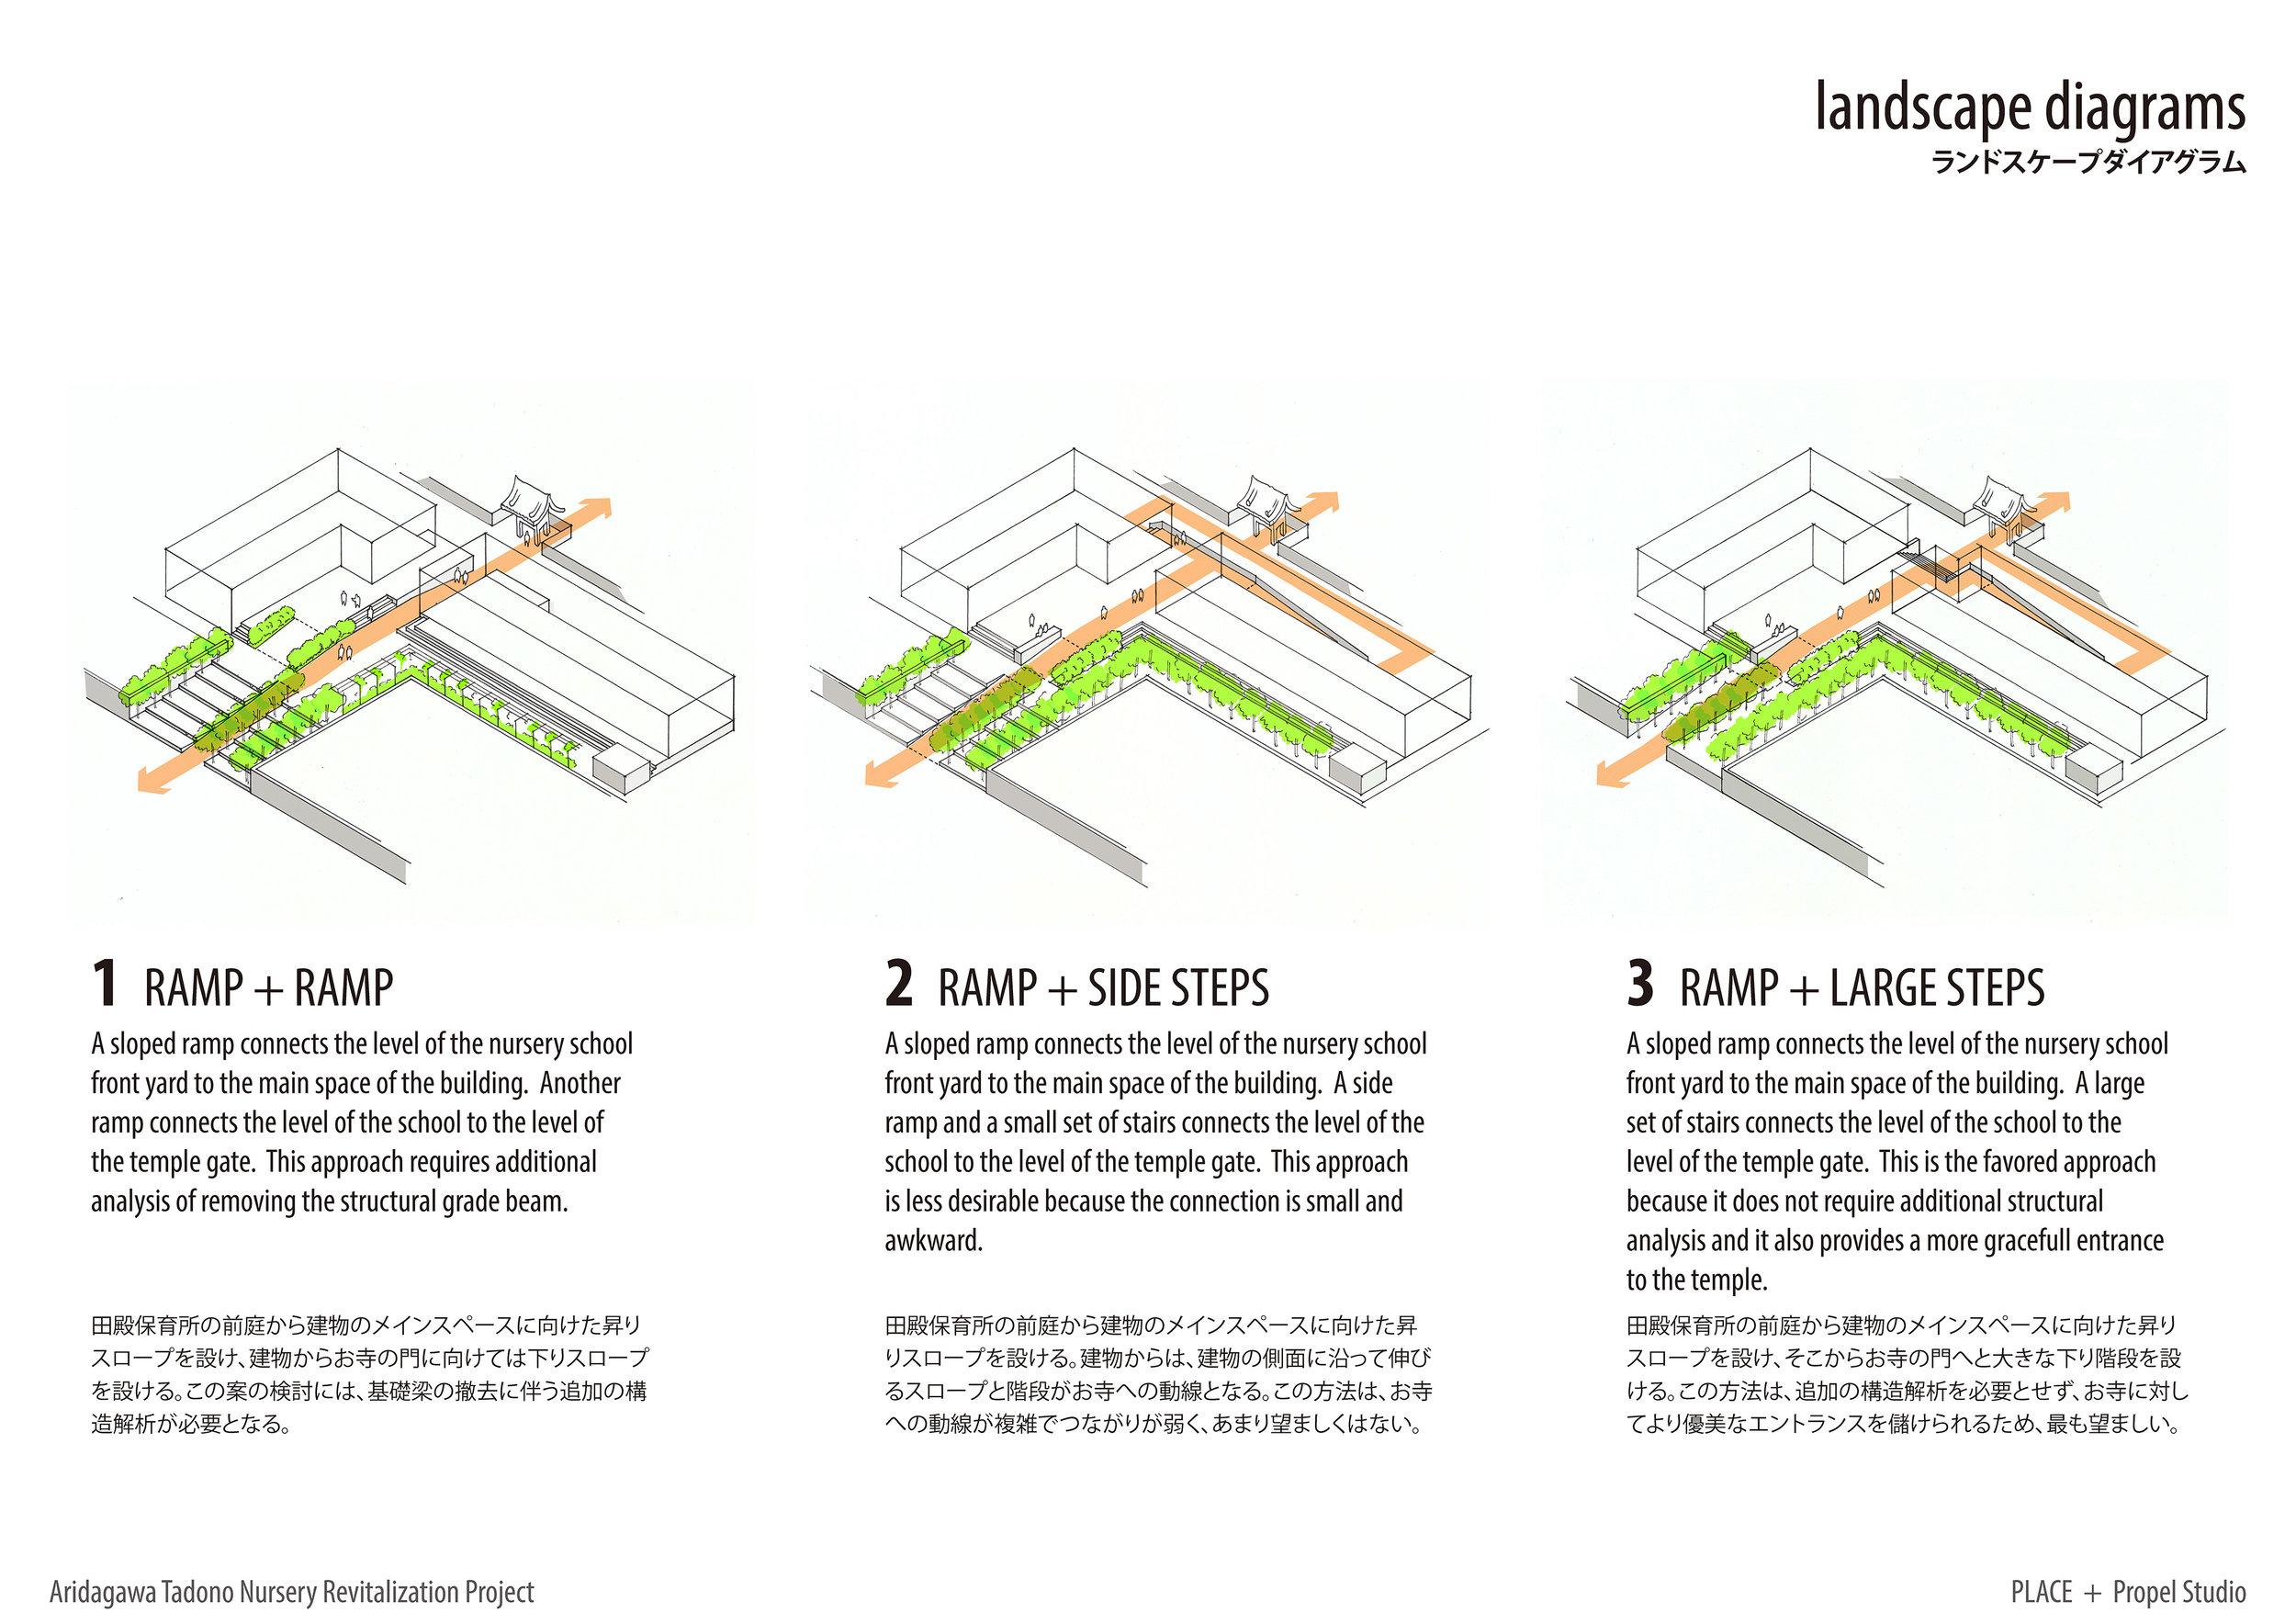 2016.06.30_Aridagawa Summary_Page_14.jpg